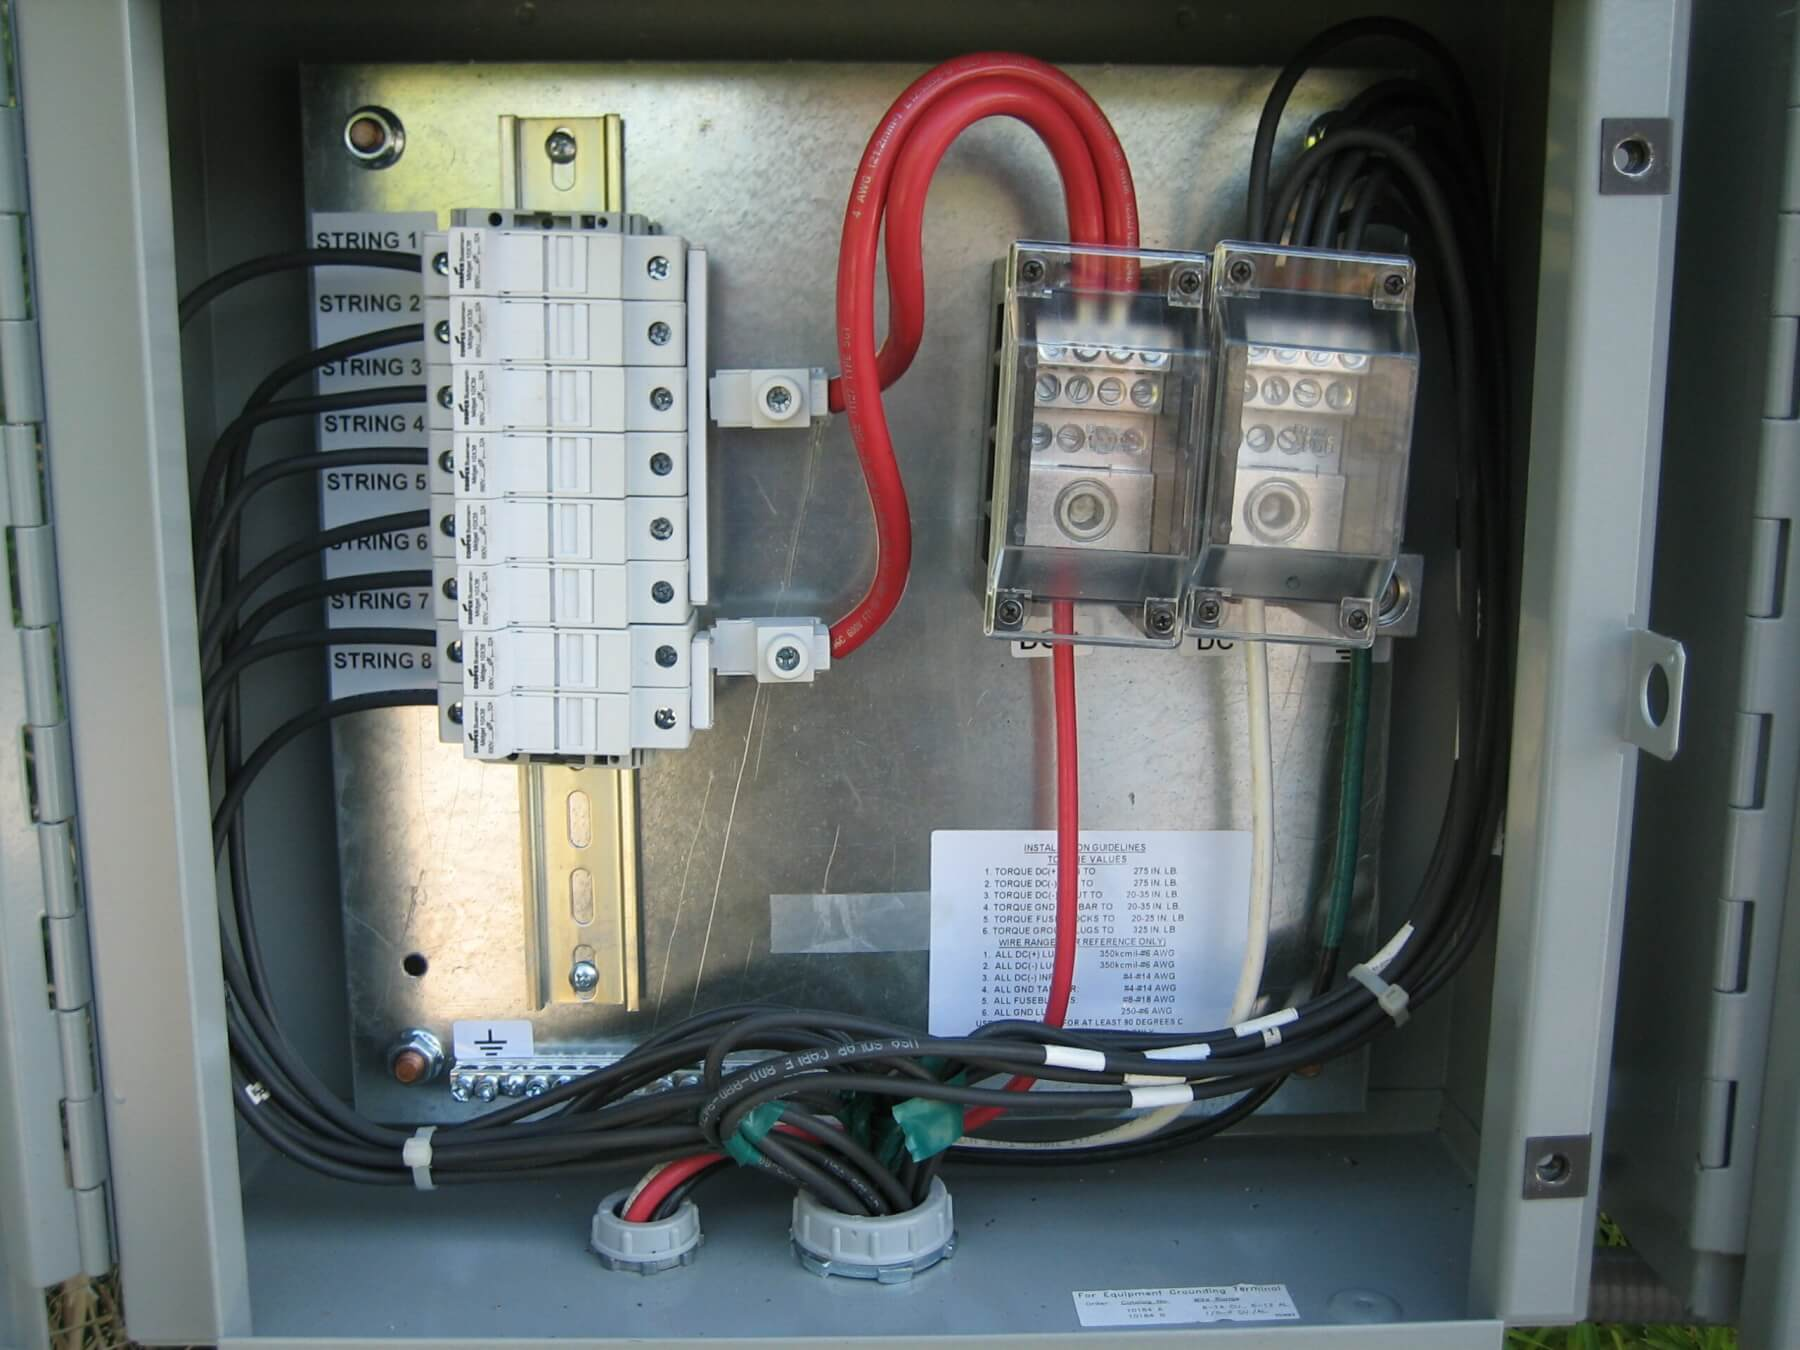 Equipment used for solar installation